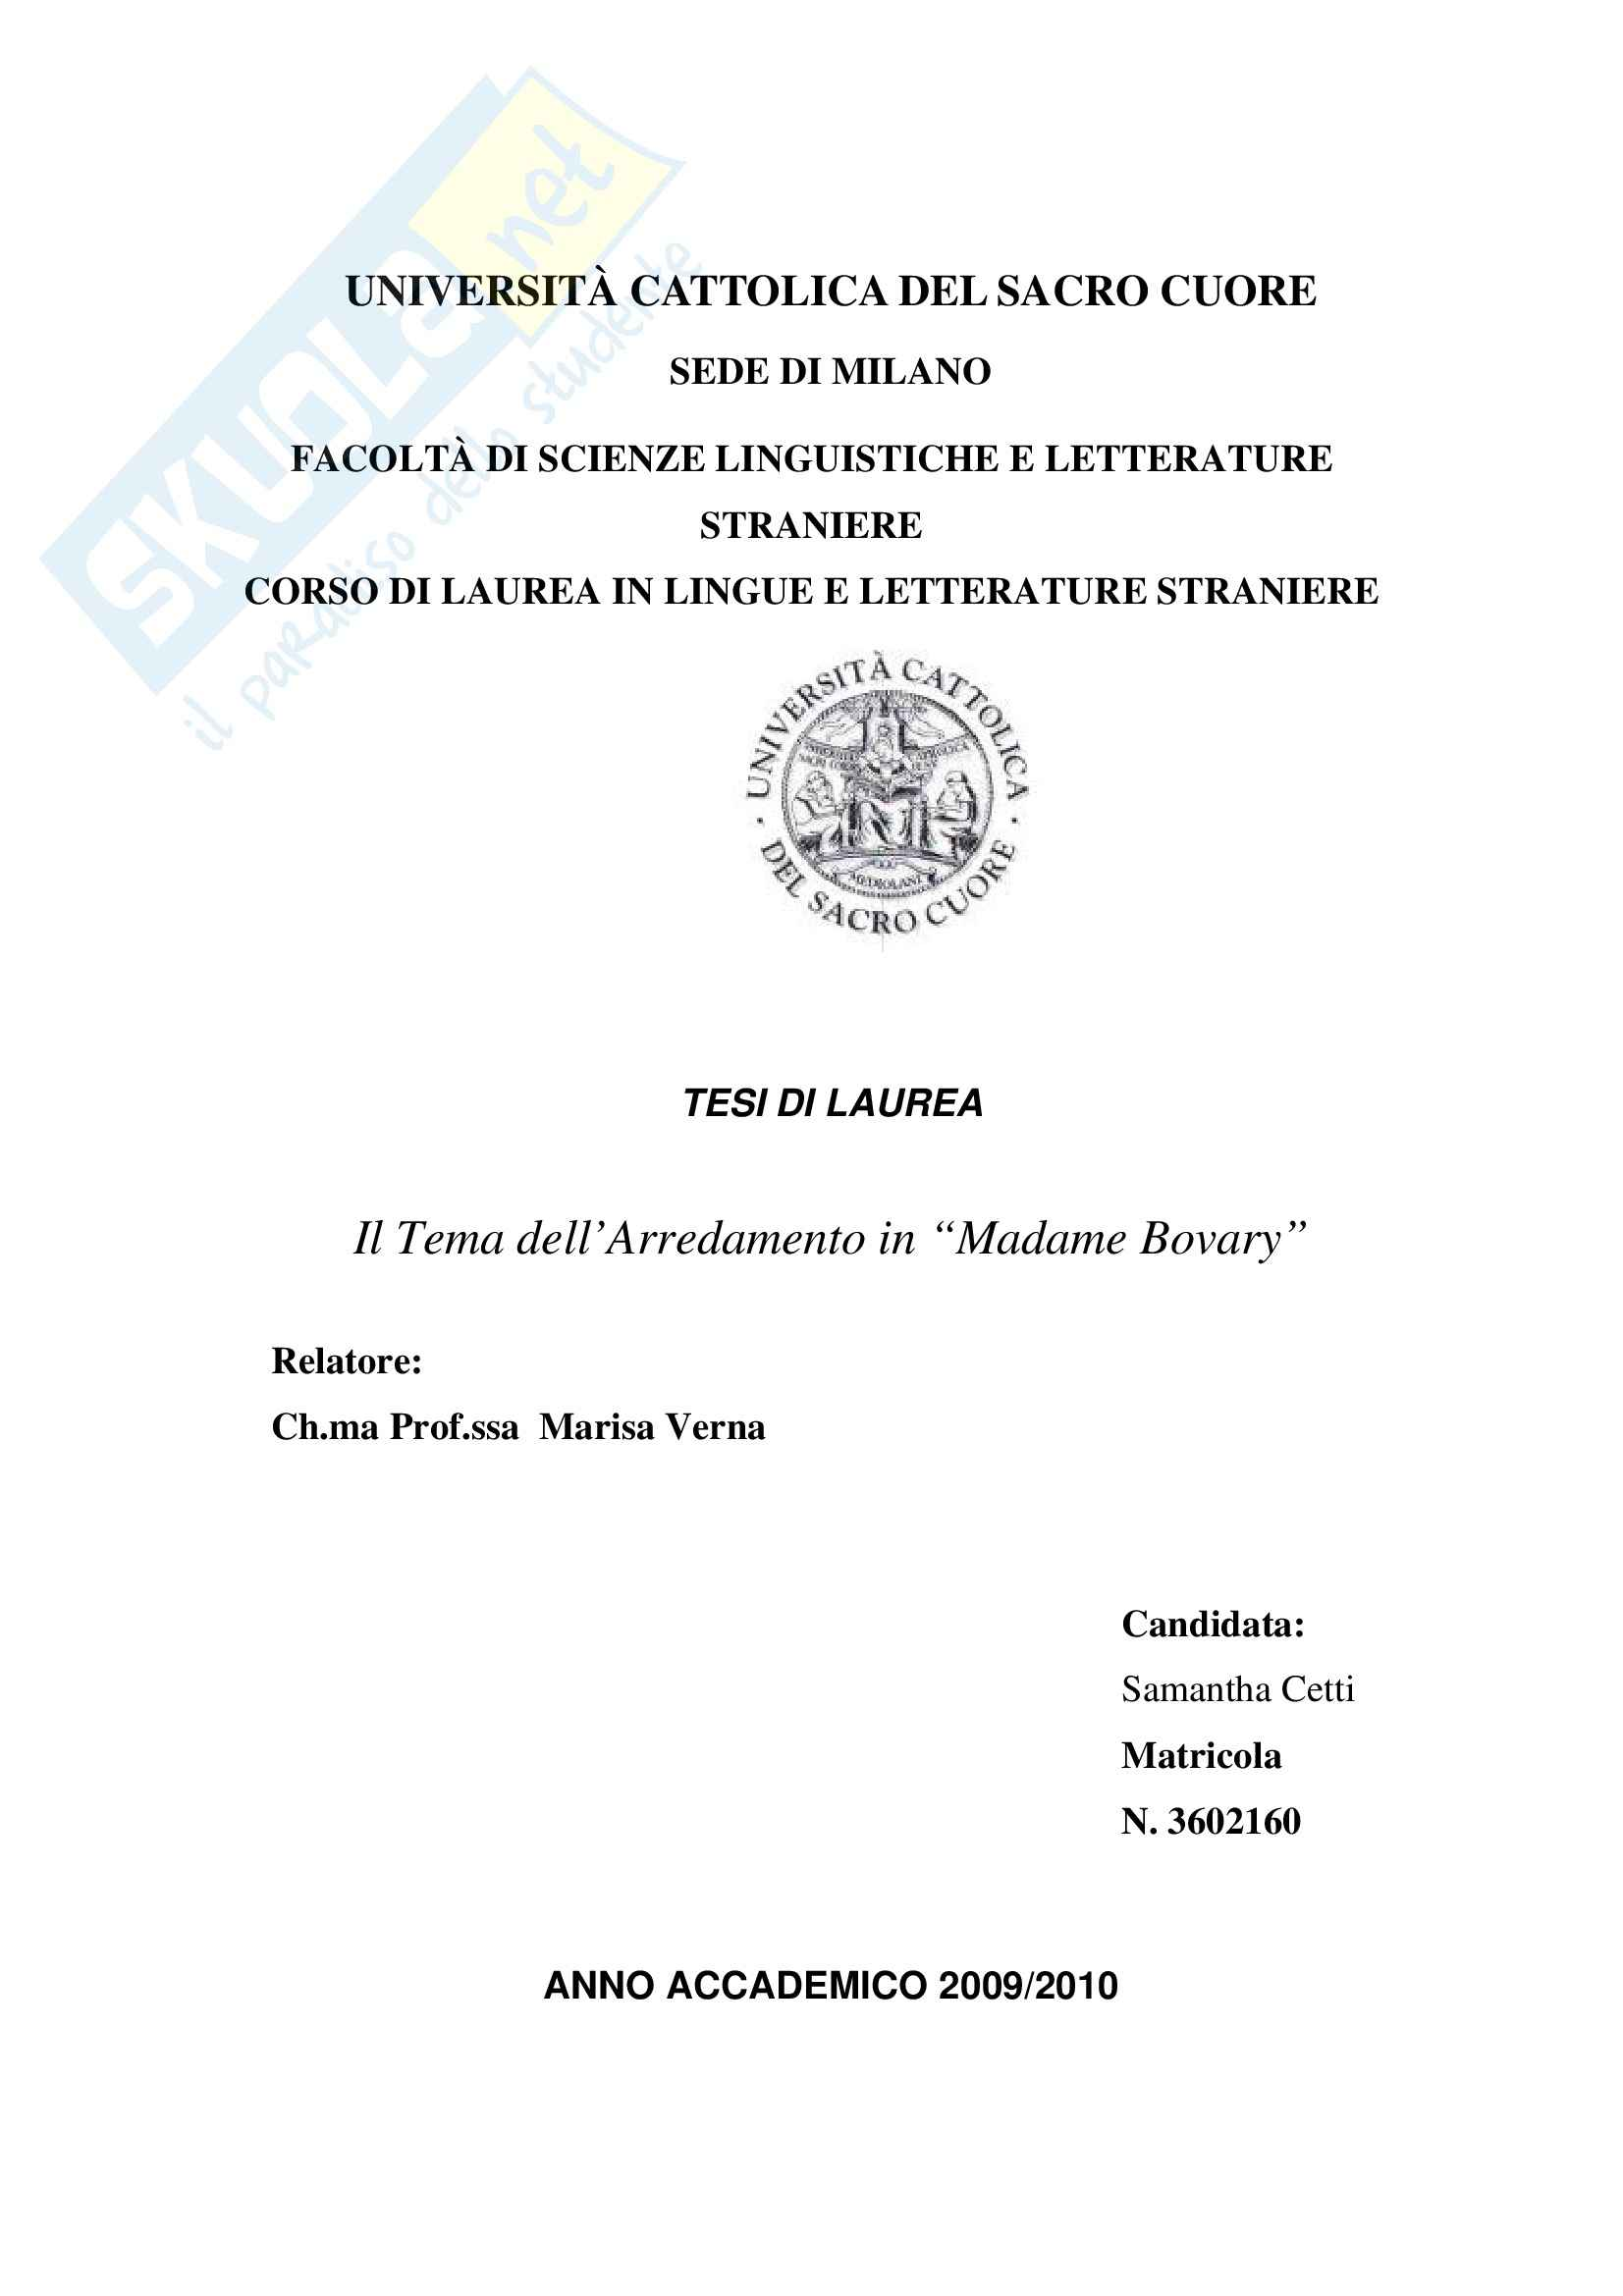 Tesi, Flaubert: il Tema dell'arredamento in Madame Bovary